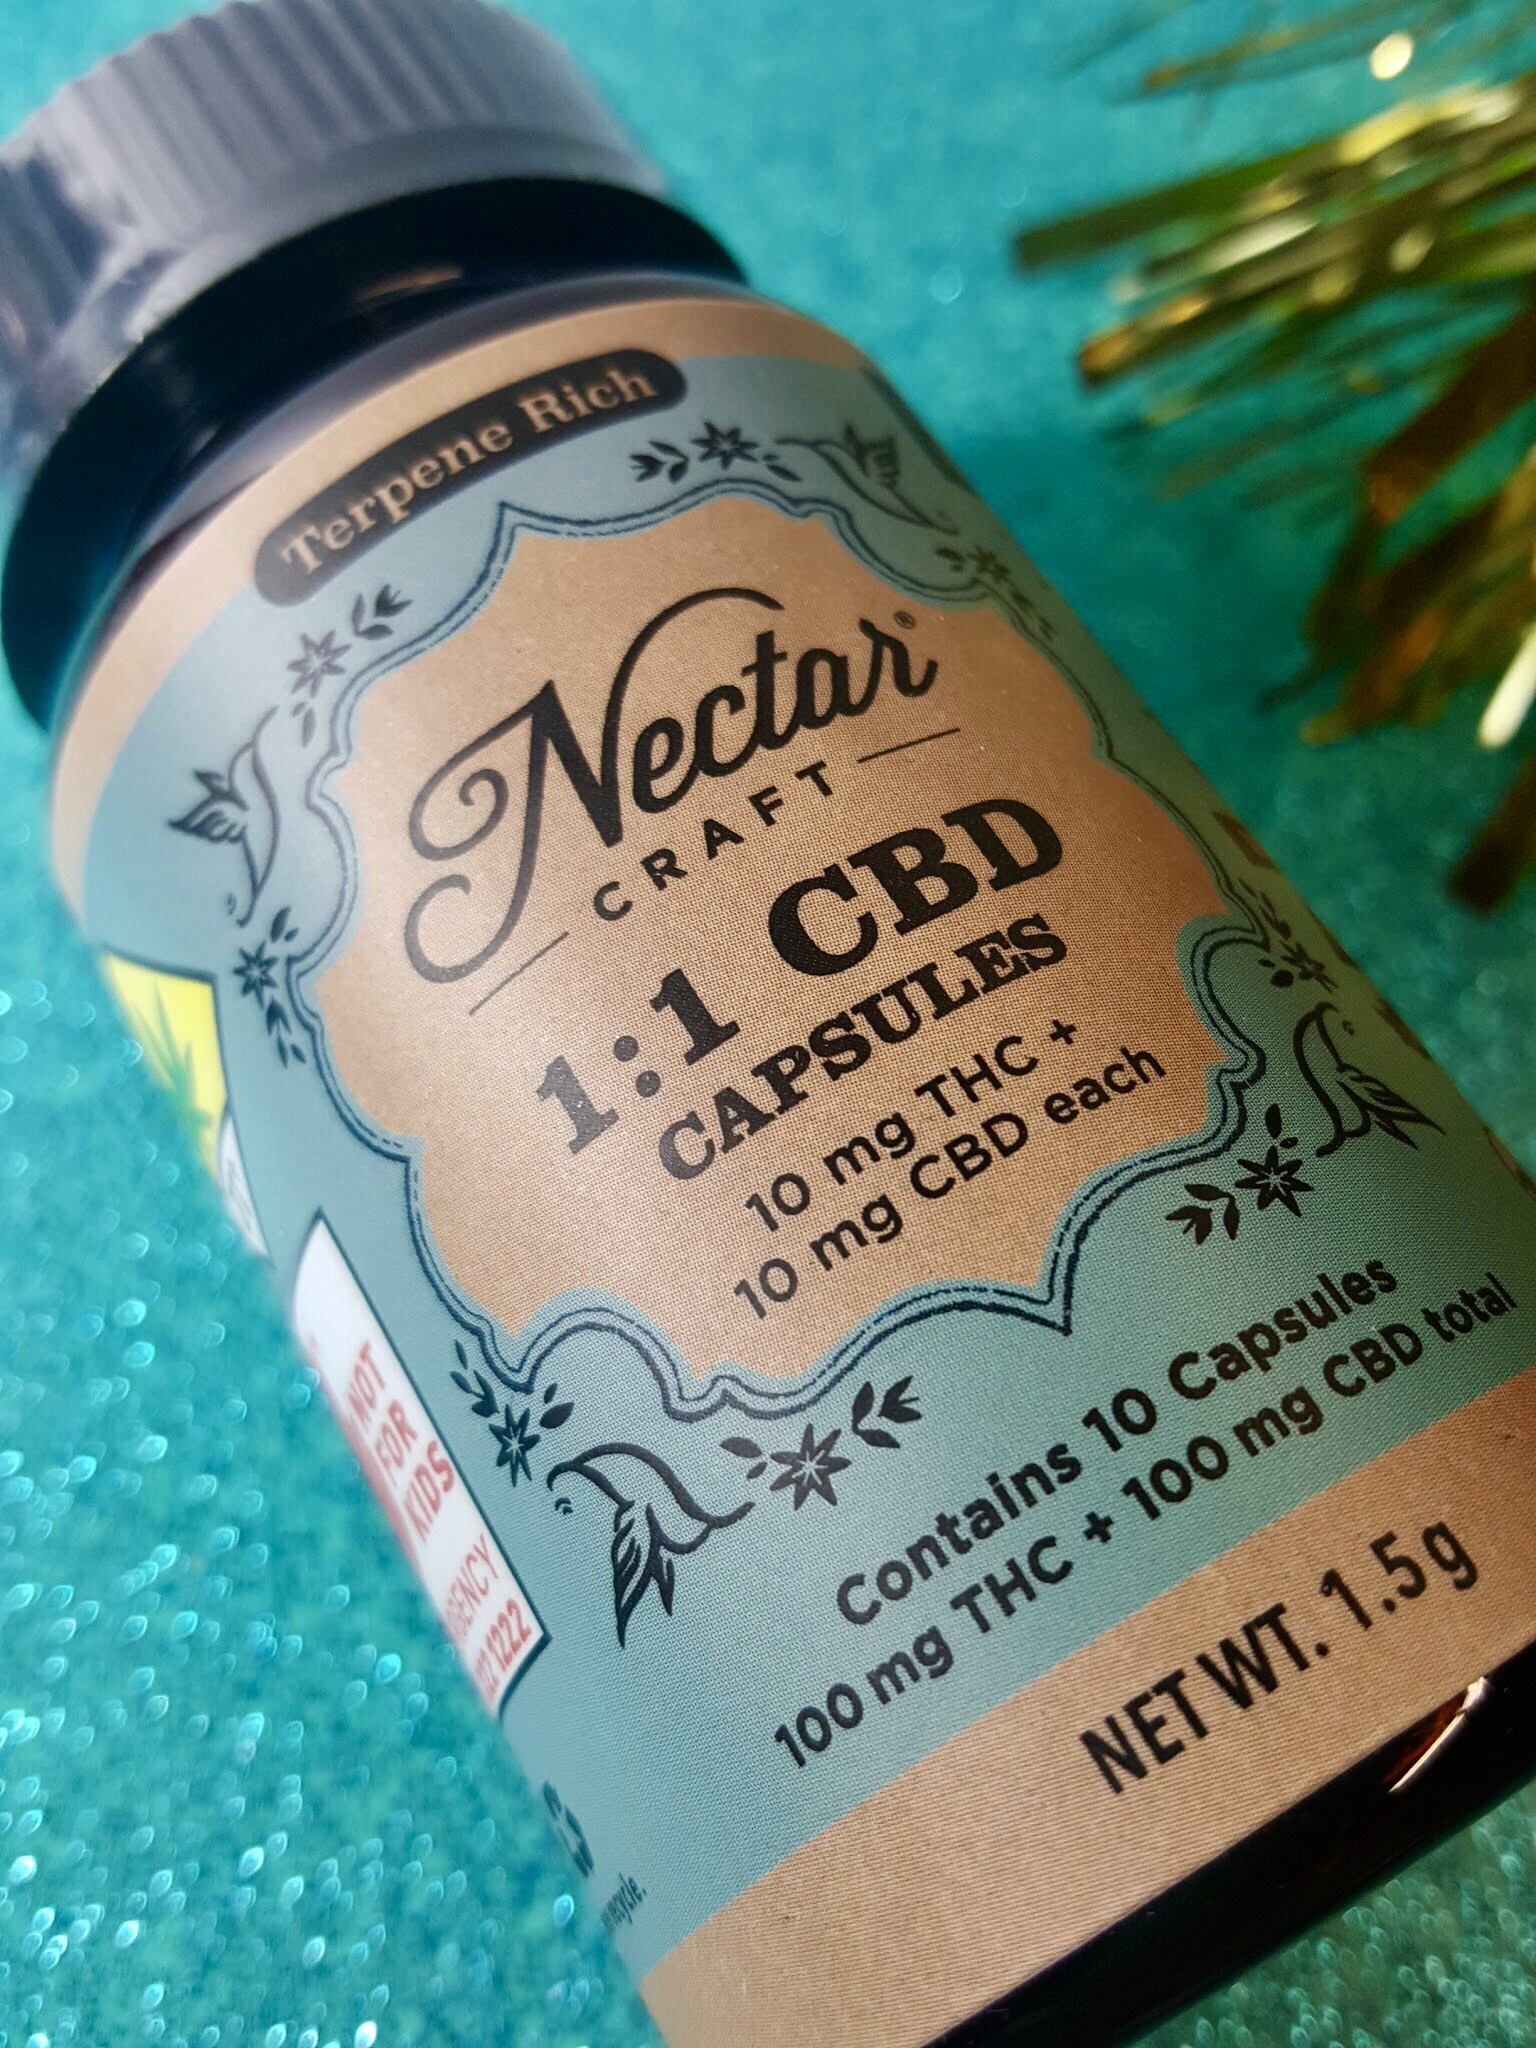 Nectar Craft Capsules 1:1 CBD Ganja Goddess